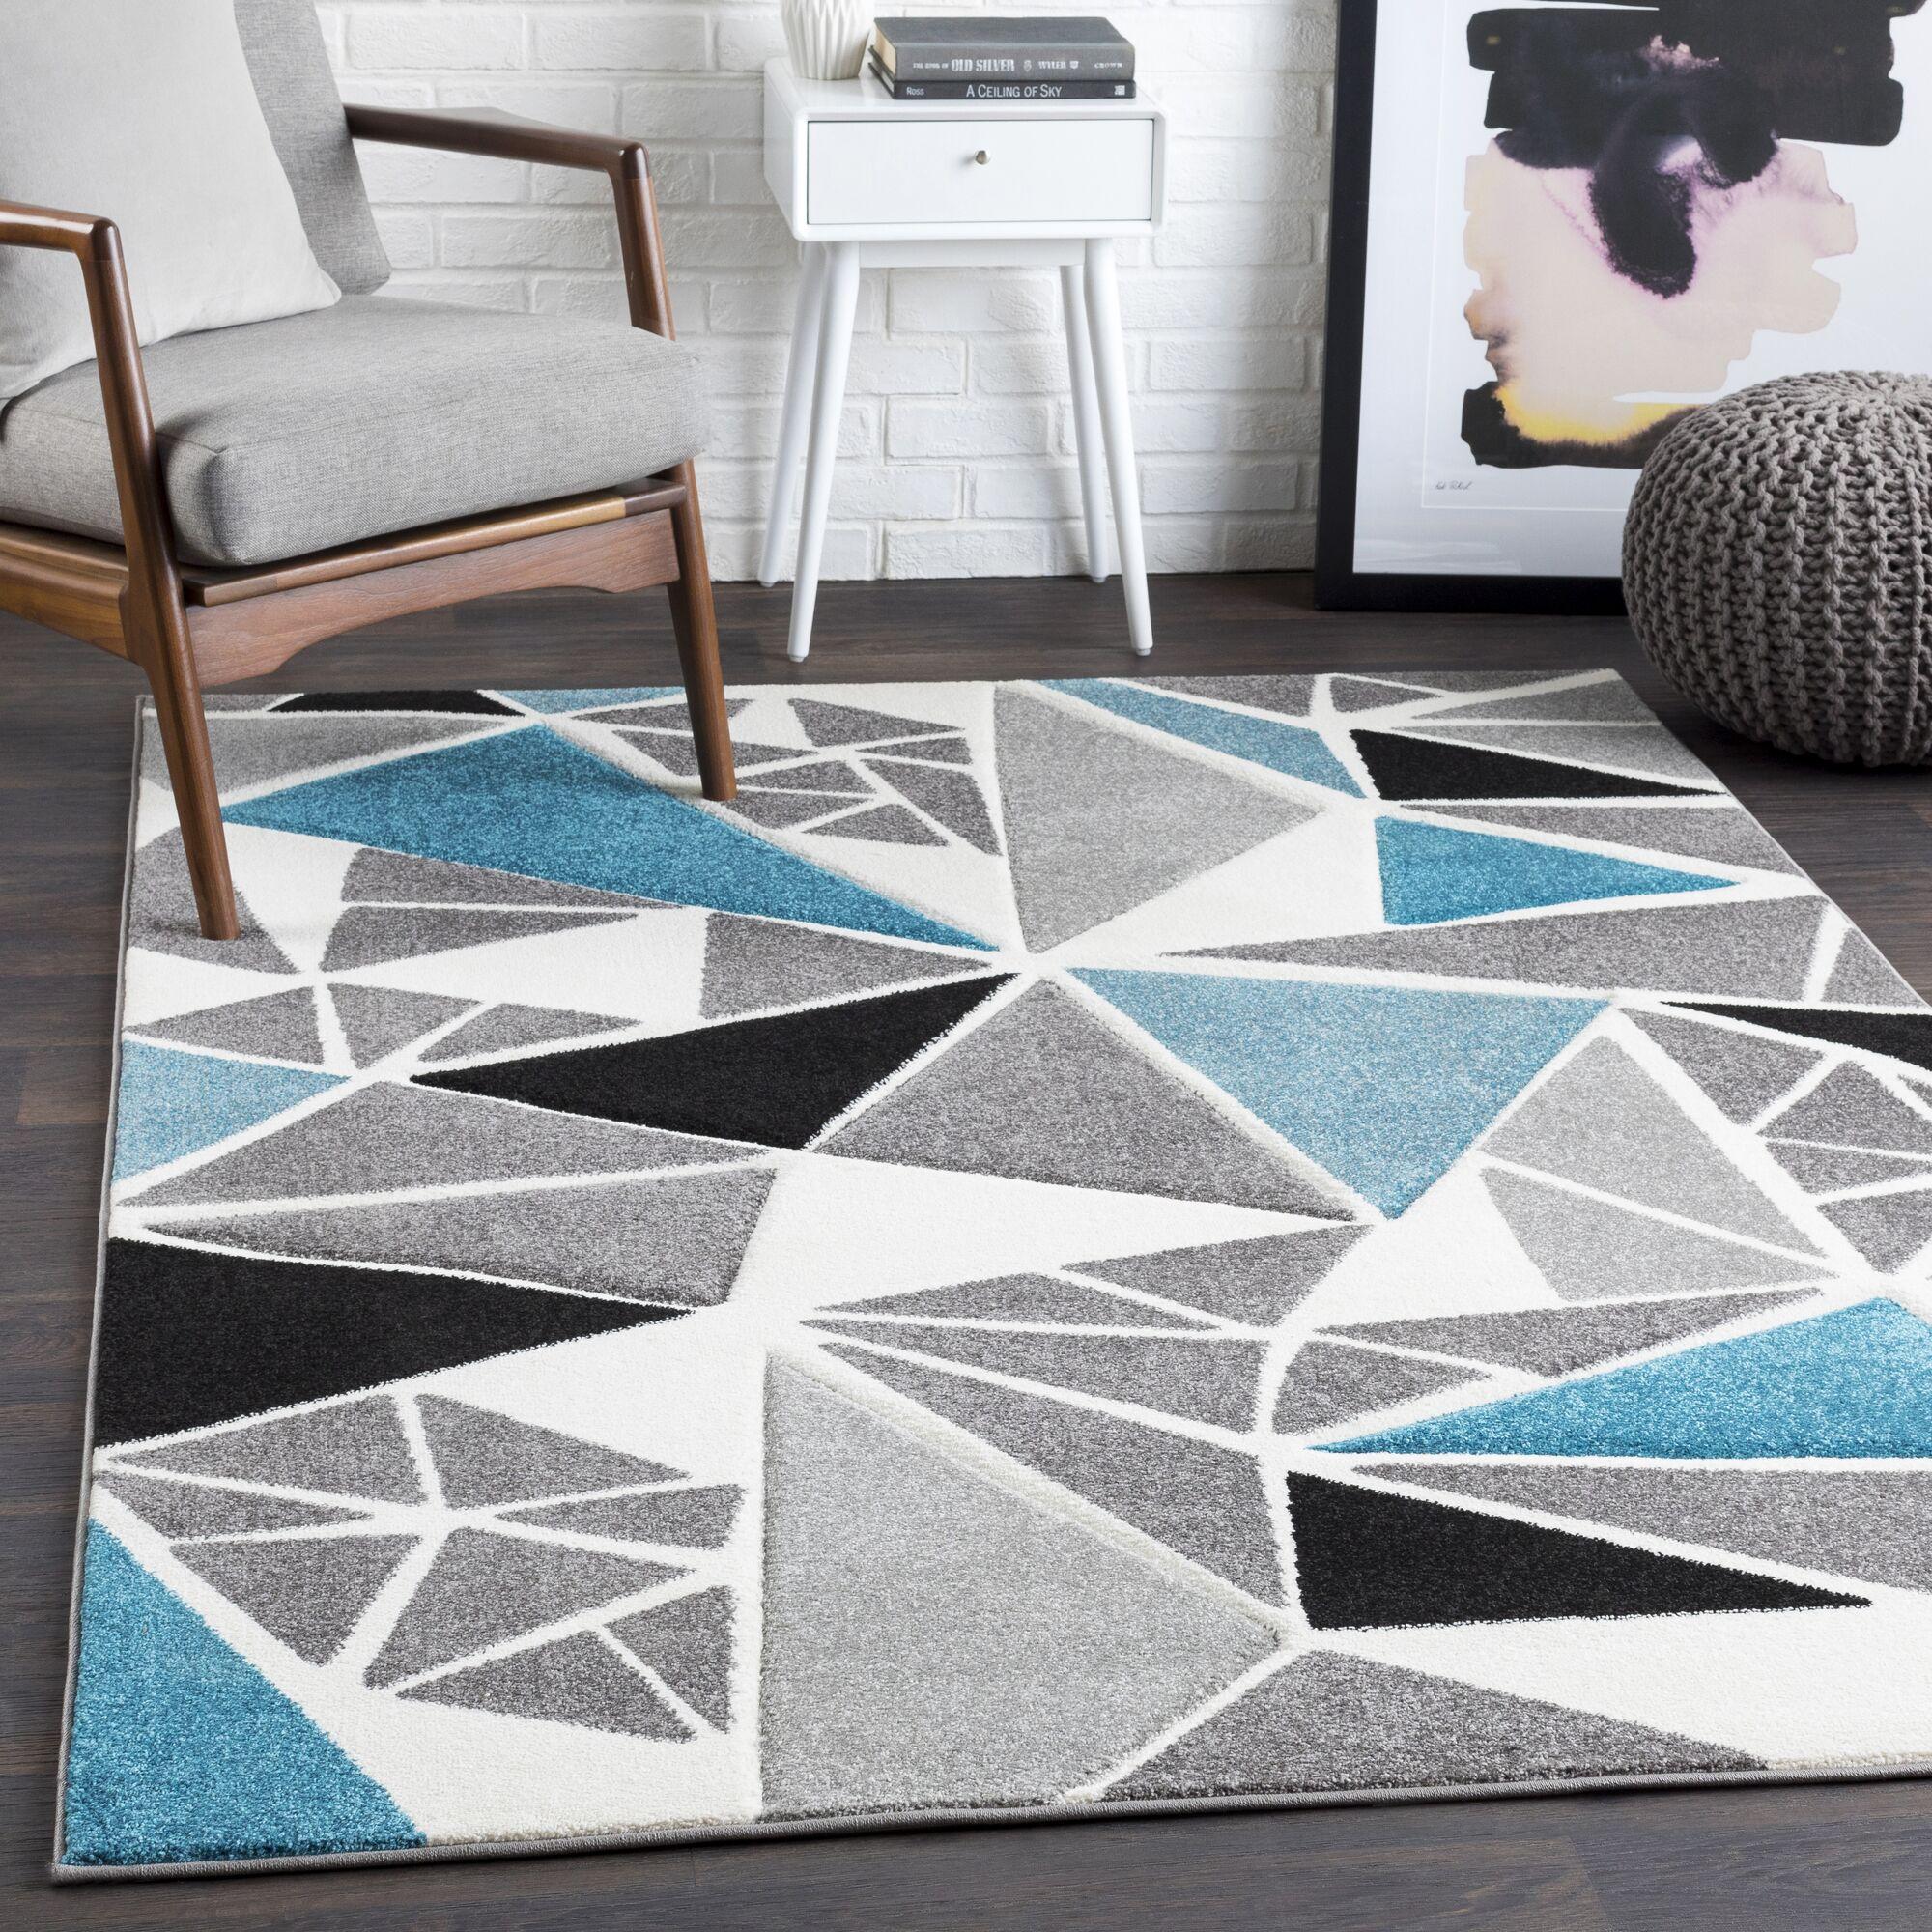 Mott Street Geometric Teal/Gray Area Rug Rug Size: Rectangle 5'3